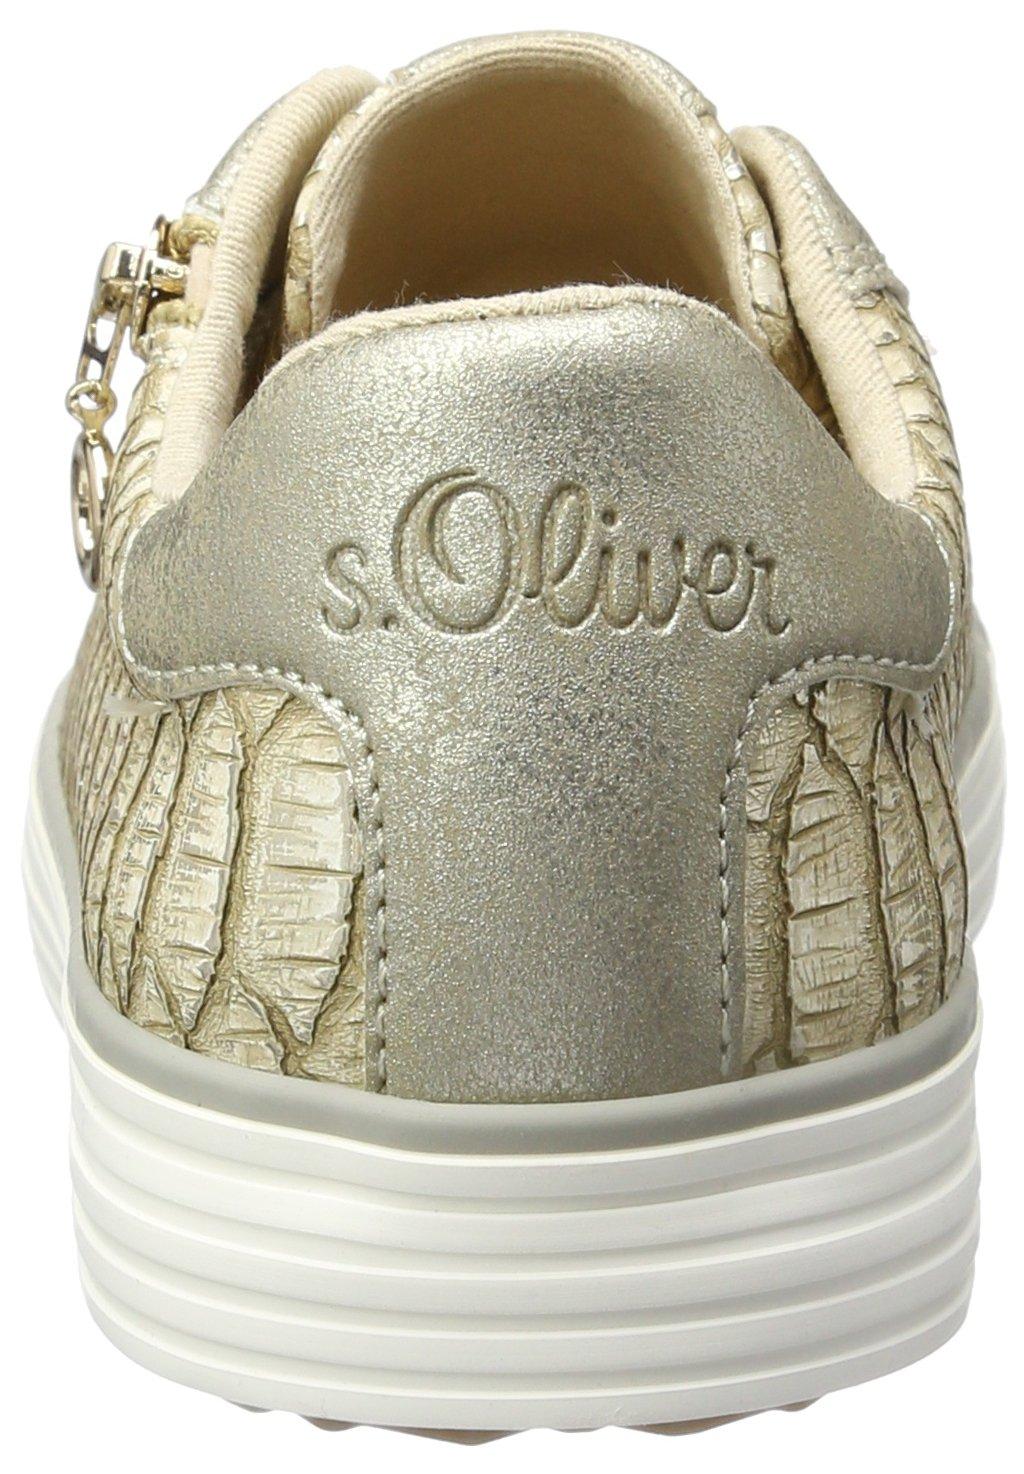 S.Oliver Damen 23615 Sneaker, Weißszlig;/silberfarben, 425) 50 EU Beige (Dune/Gold 425) Weißszlig;/silberfarben, 36dd87